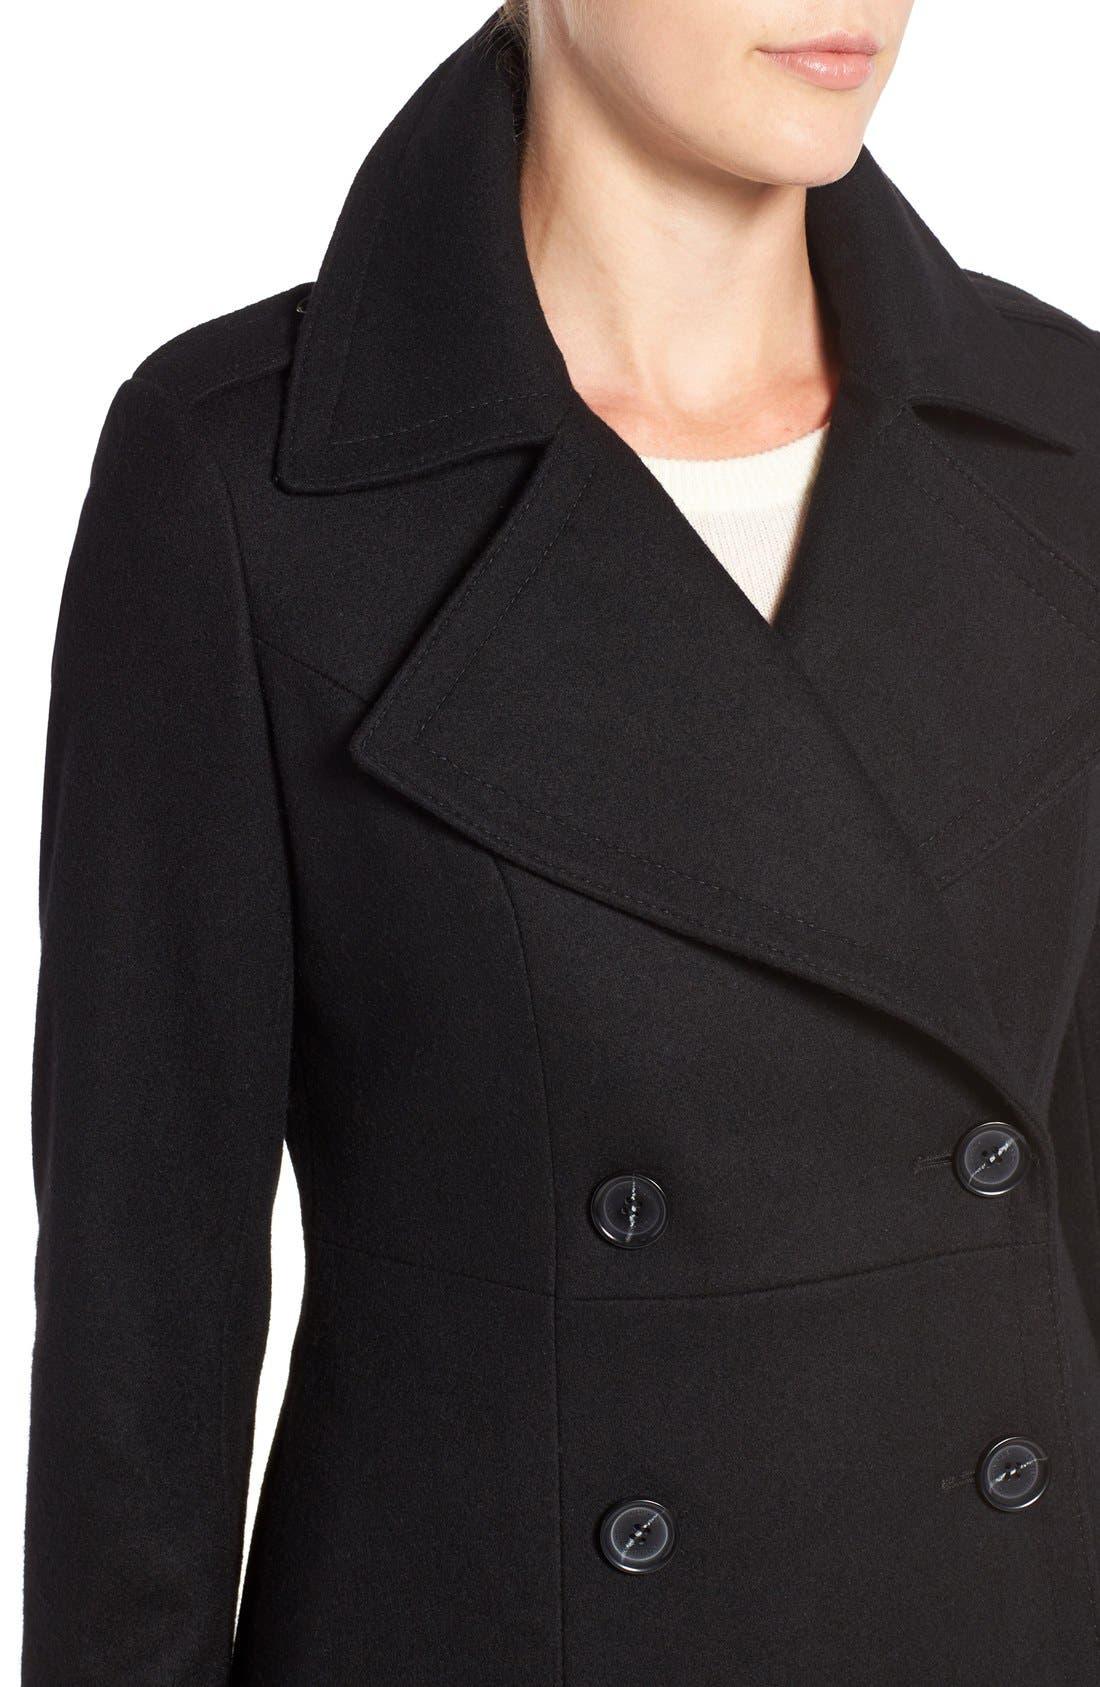 Long Wool Blend Coat,                             Alternate thumbnail 4, color,